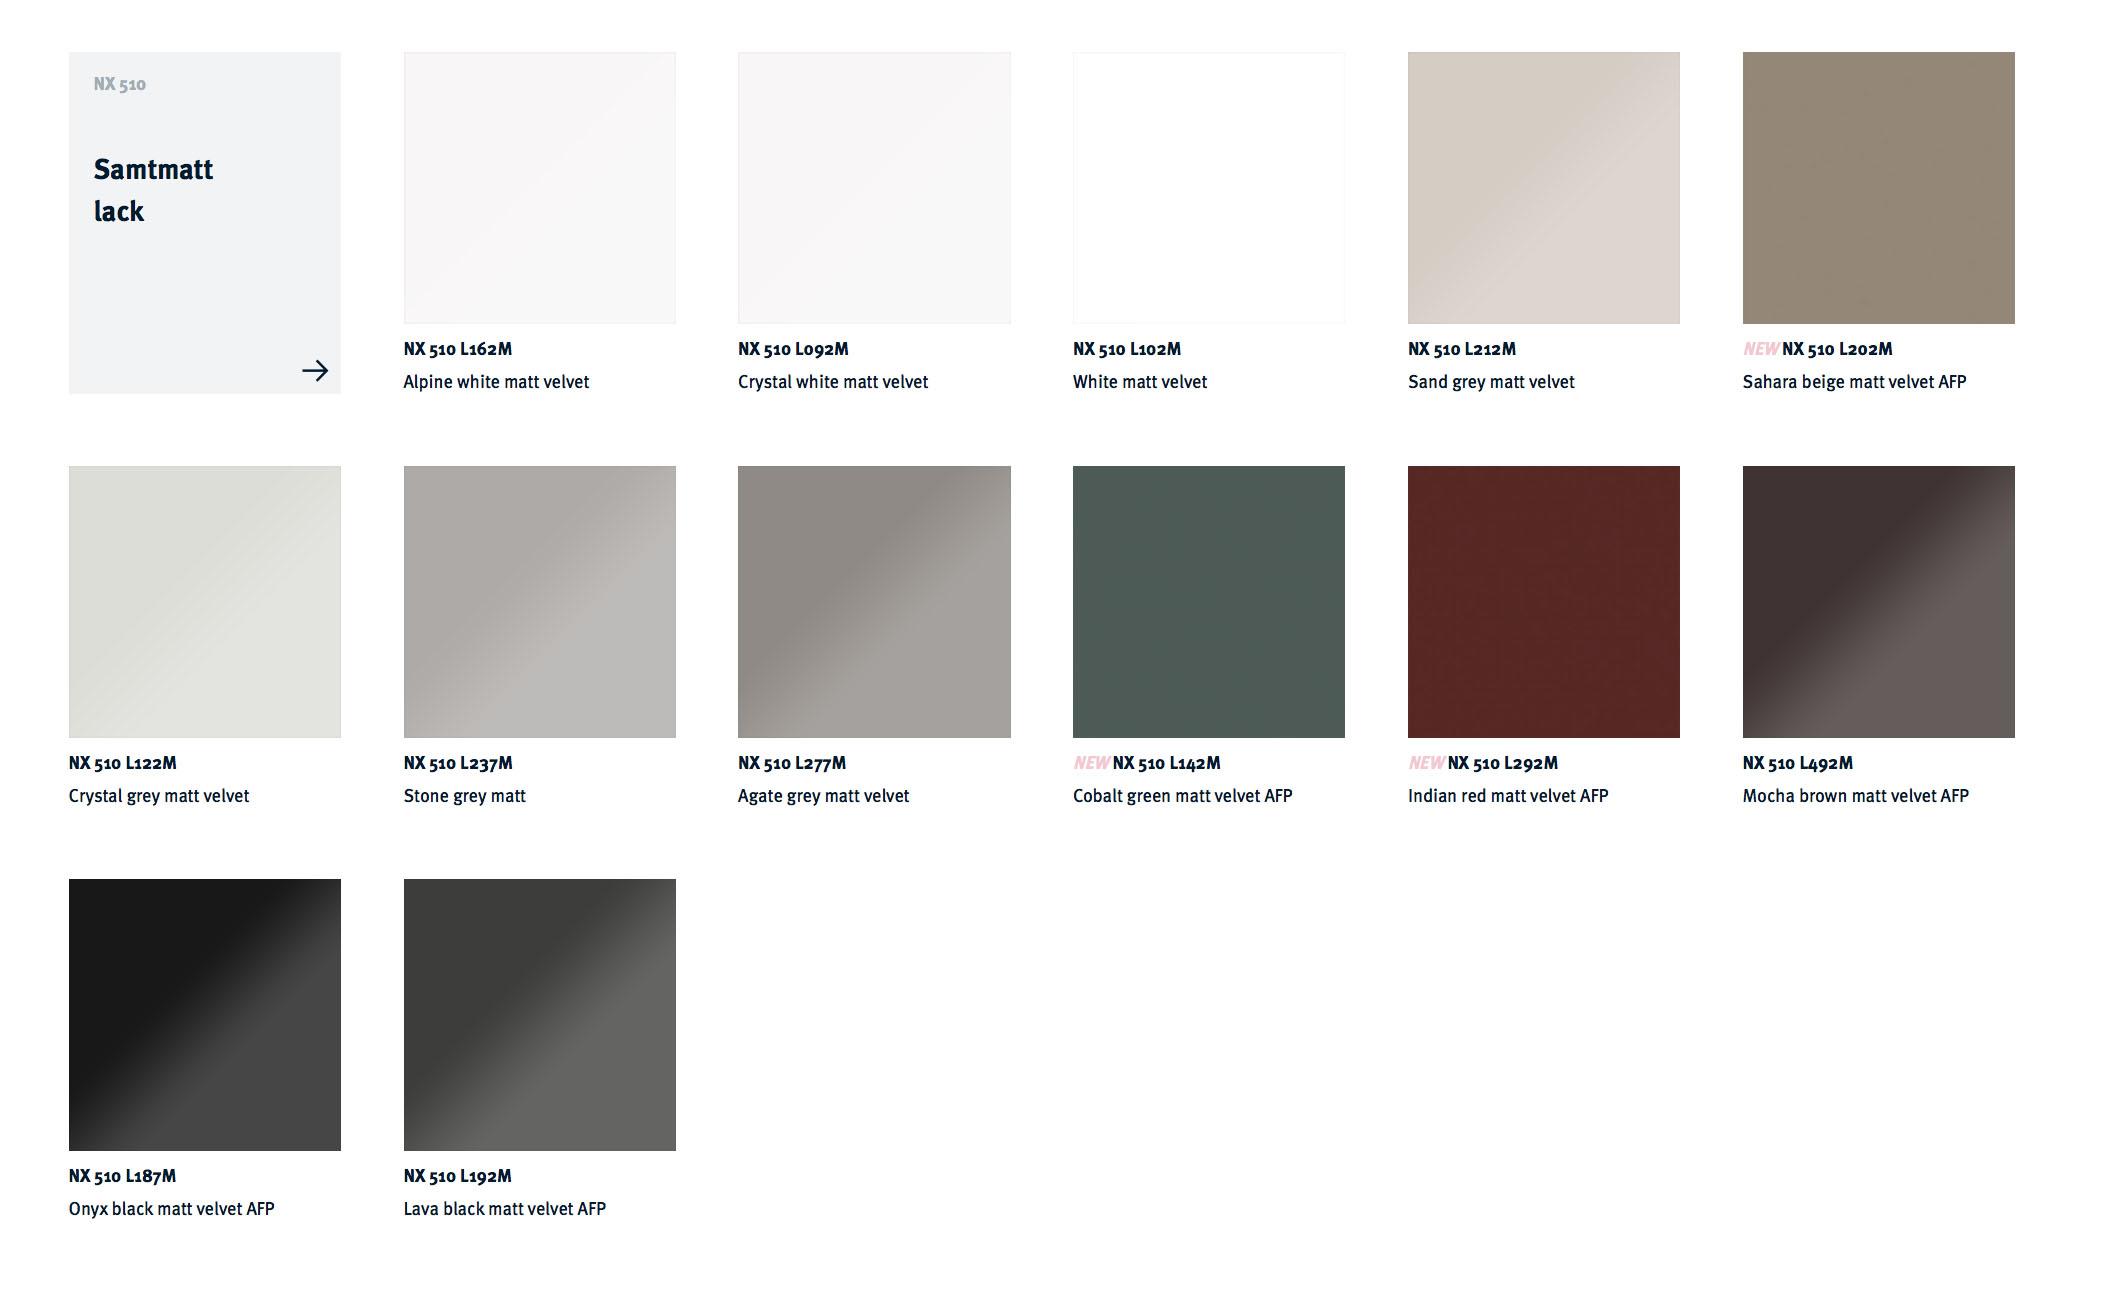 next125 kitchens NX 510 colour choices